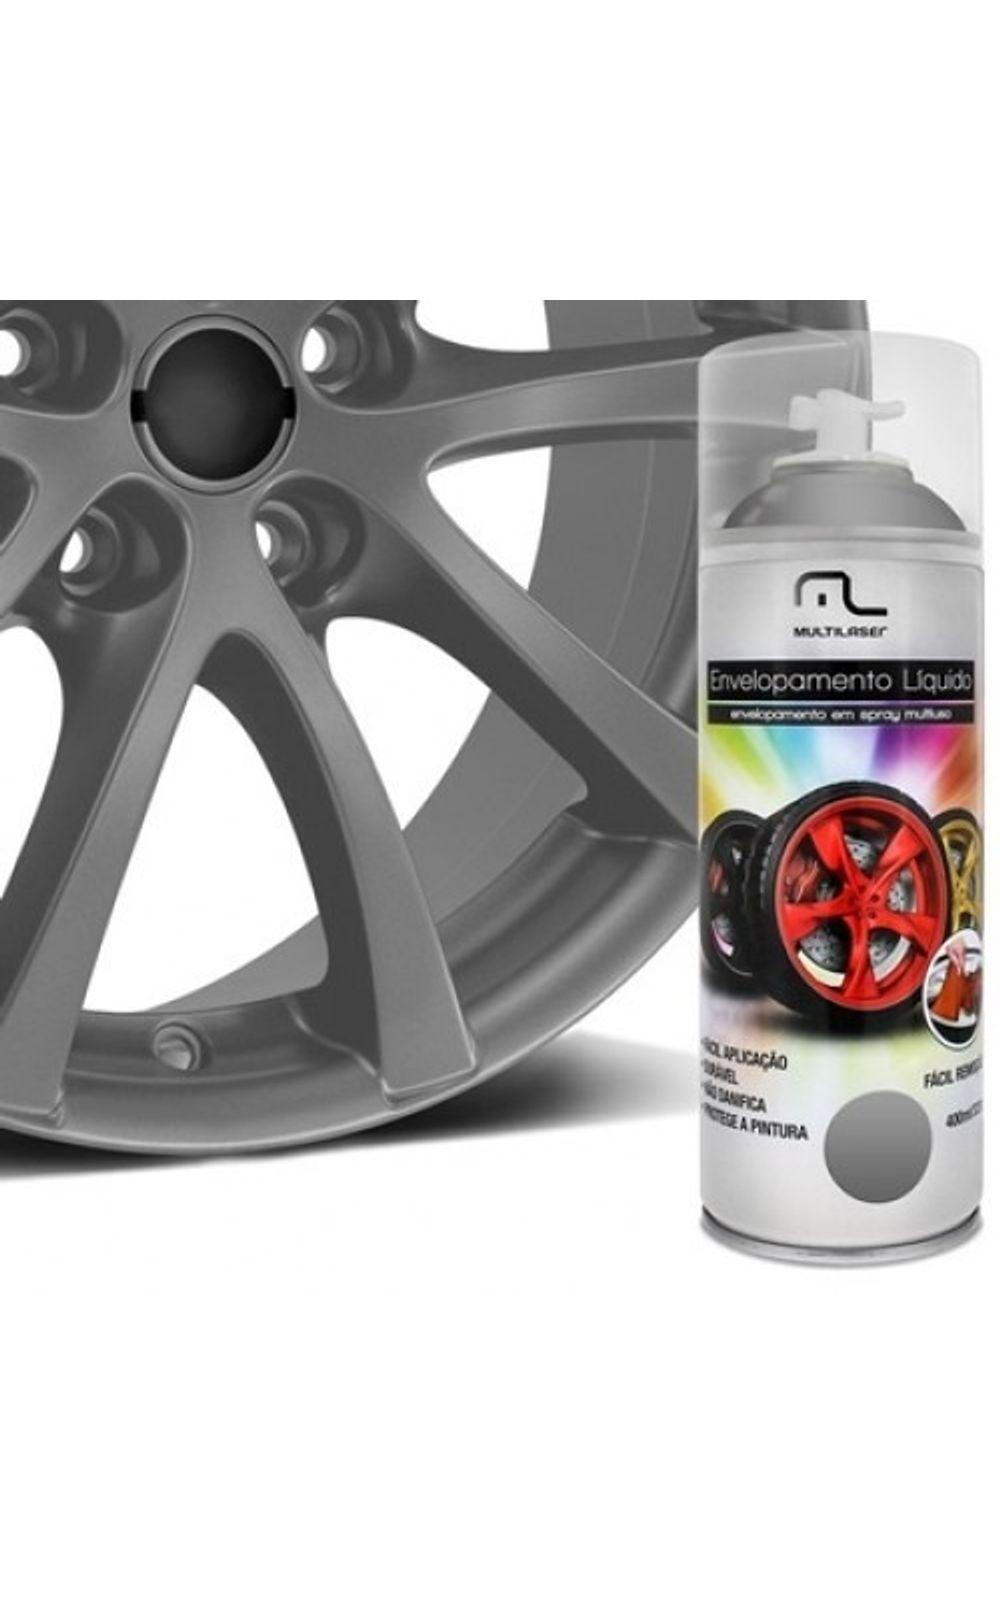 Foto 1 - Spray de Envelopamento Multilaser Liquido Grafite 400ml - AU429